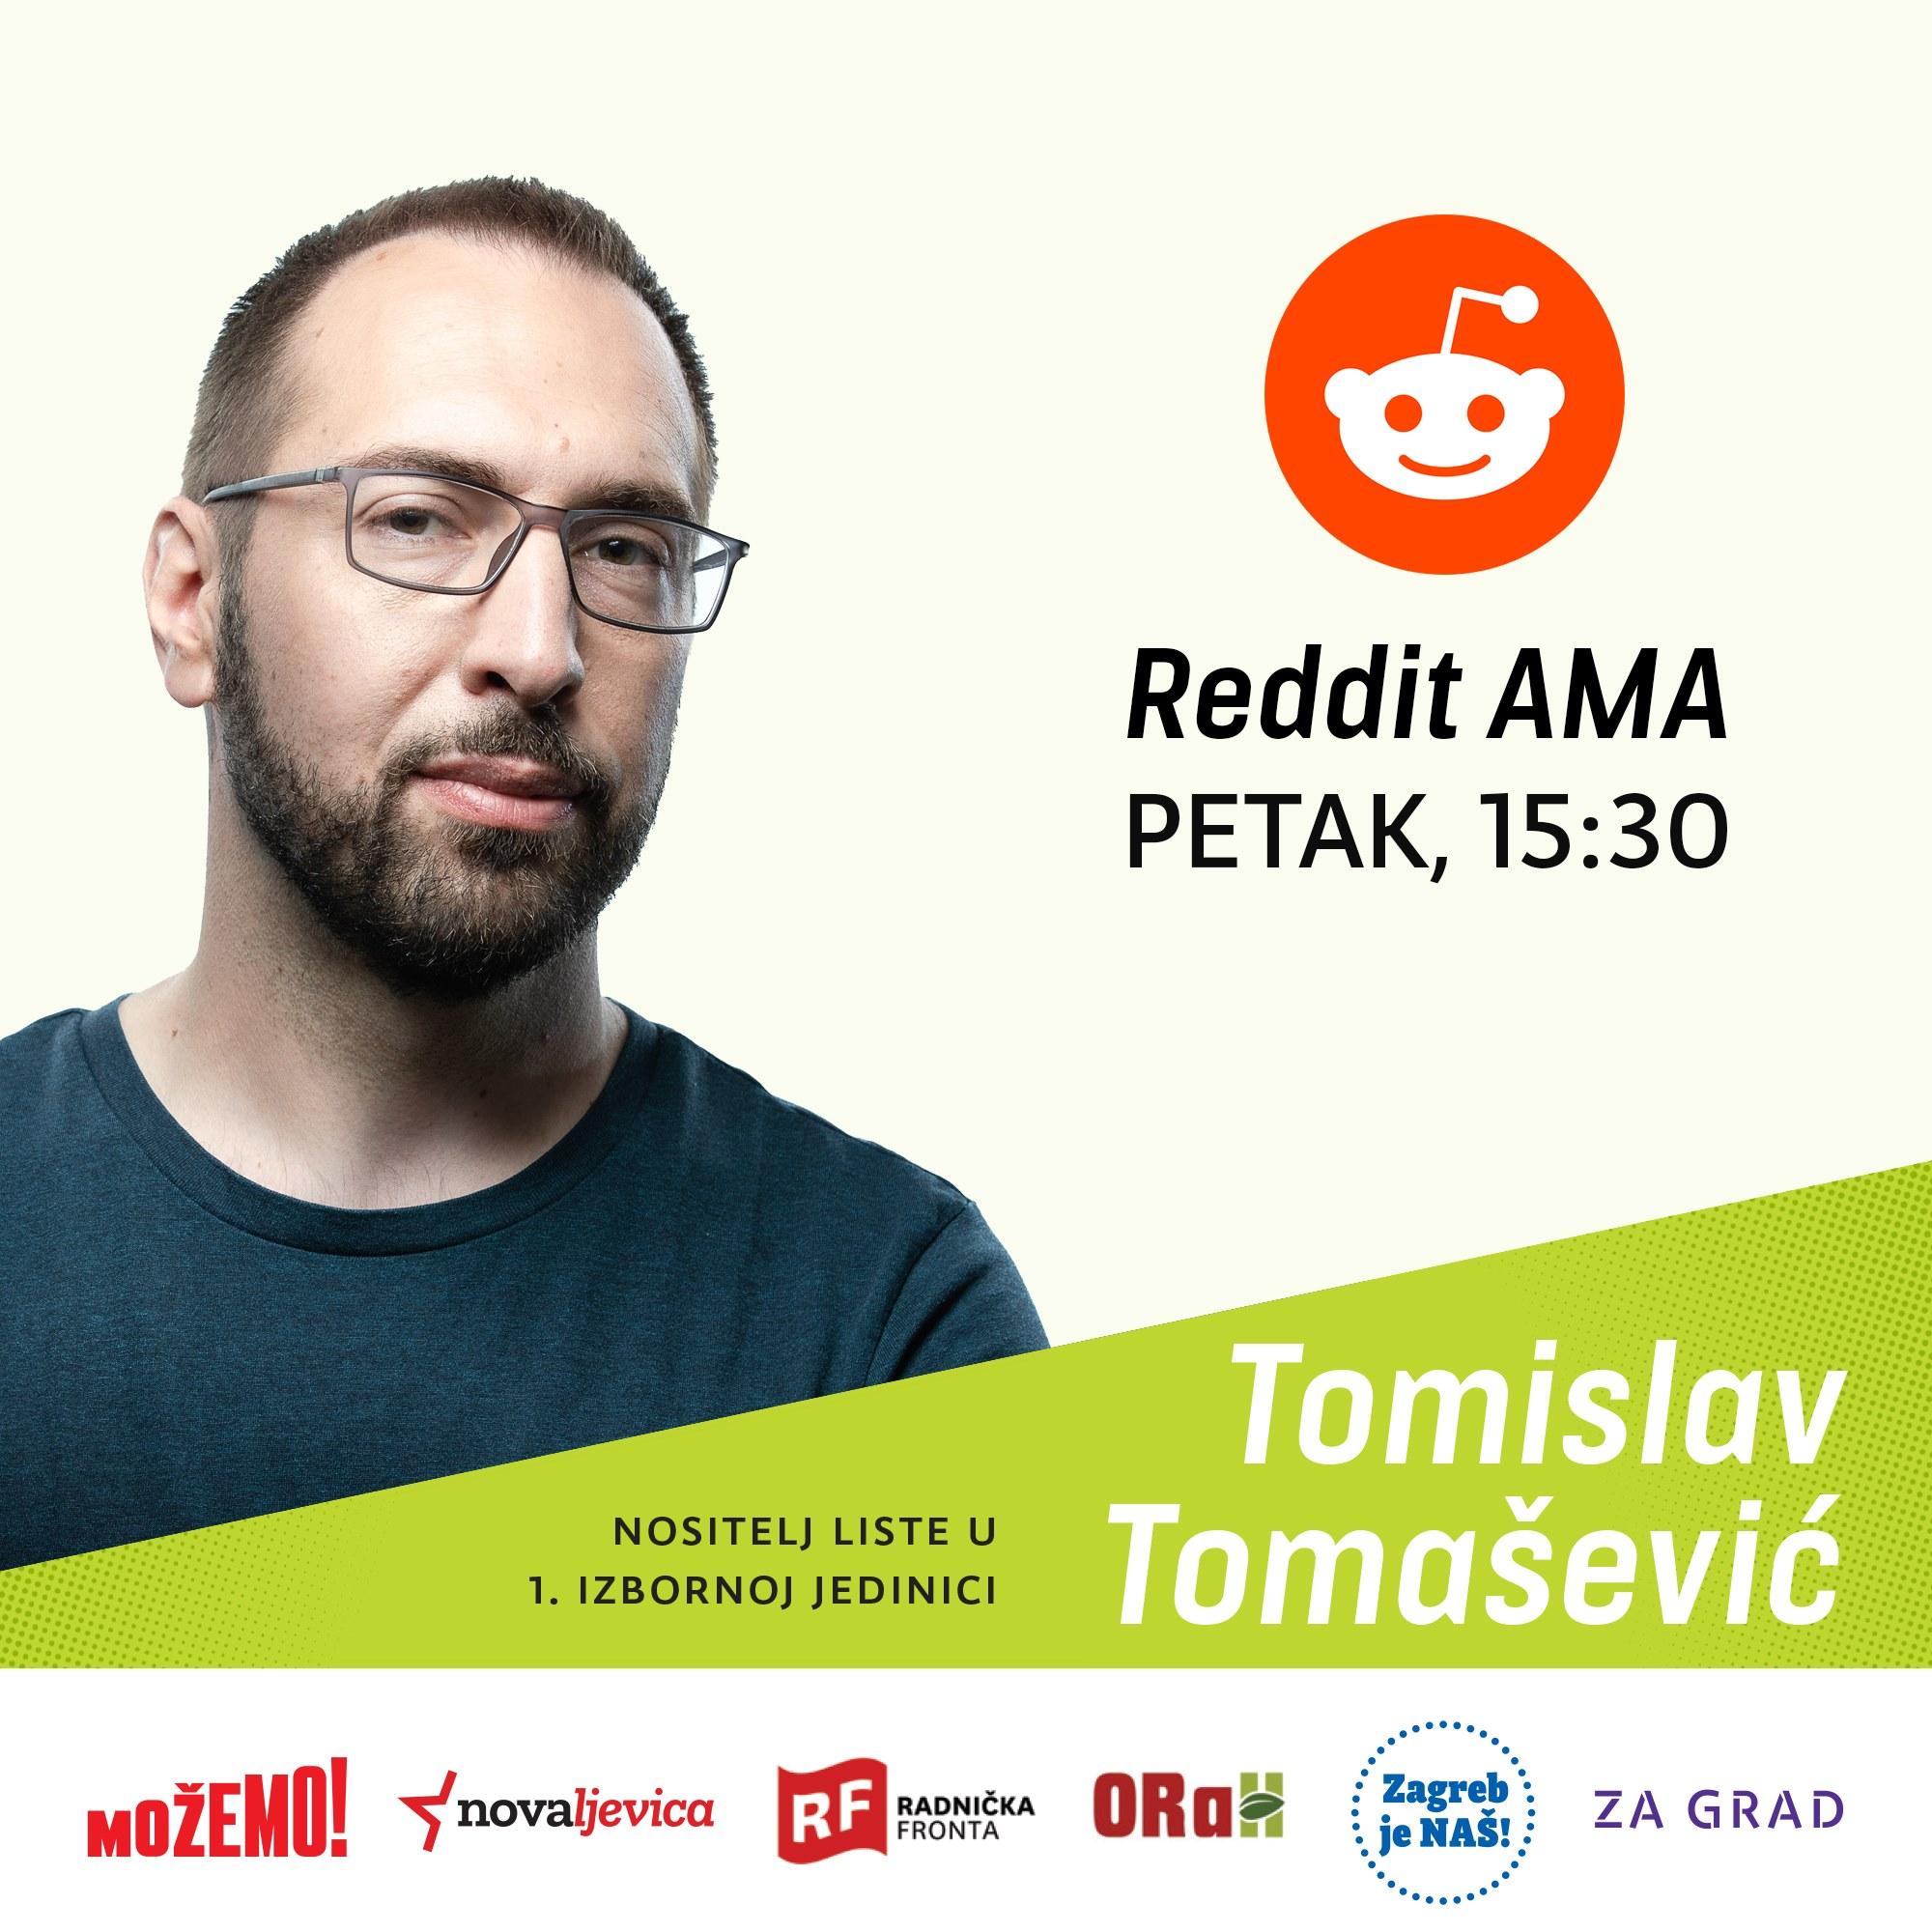 U petak od 15:30 sati ulovite Tomislava Tomaševića na Redditu!